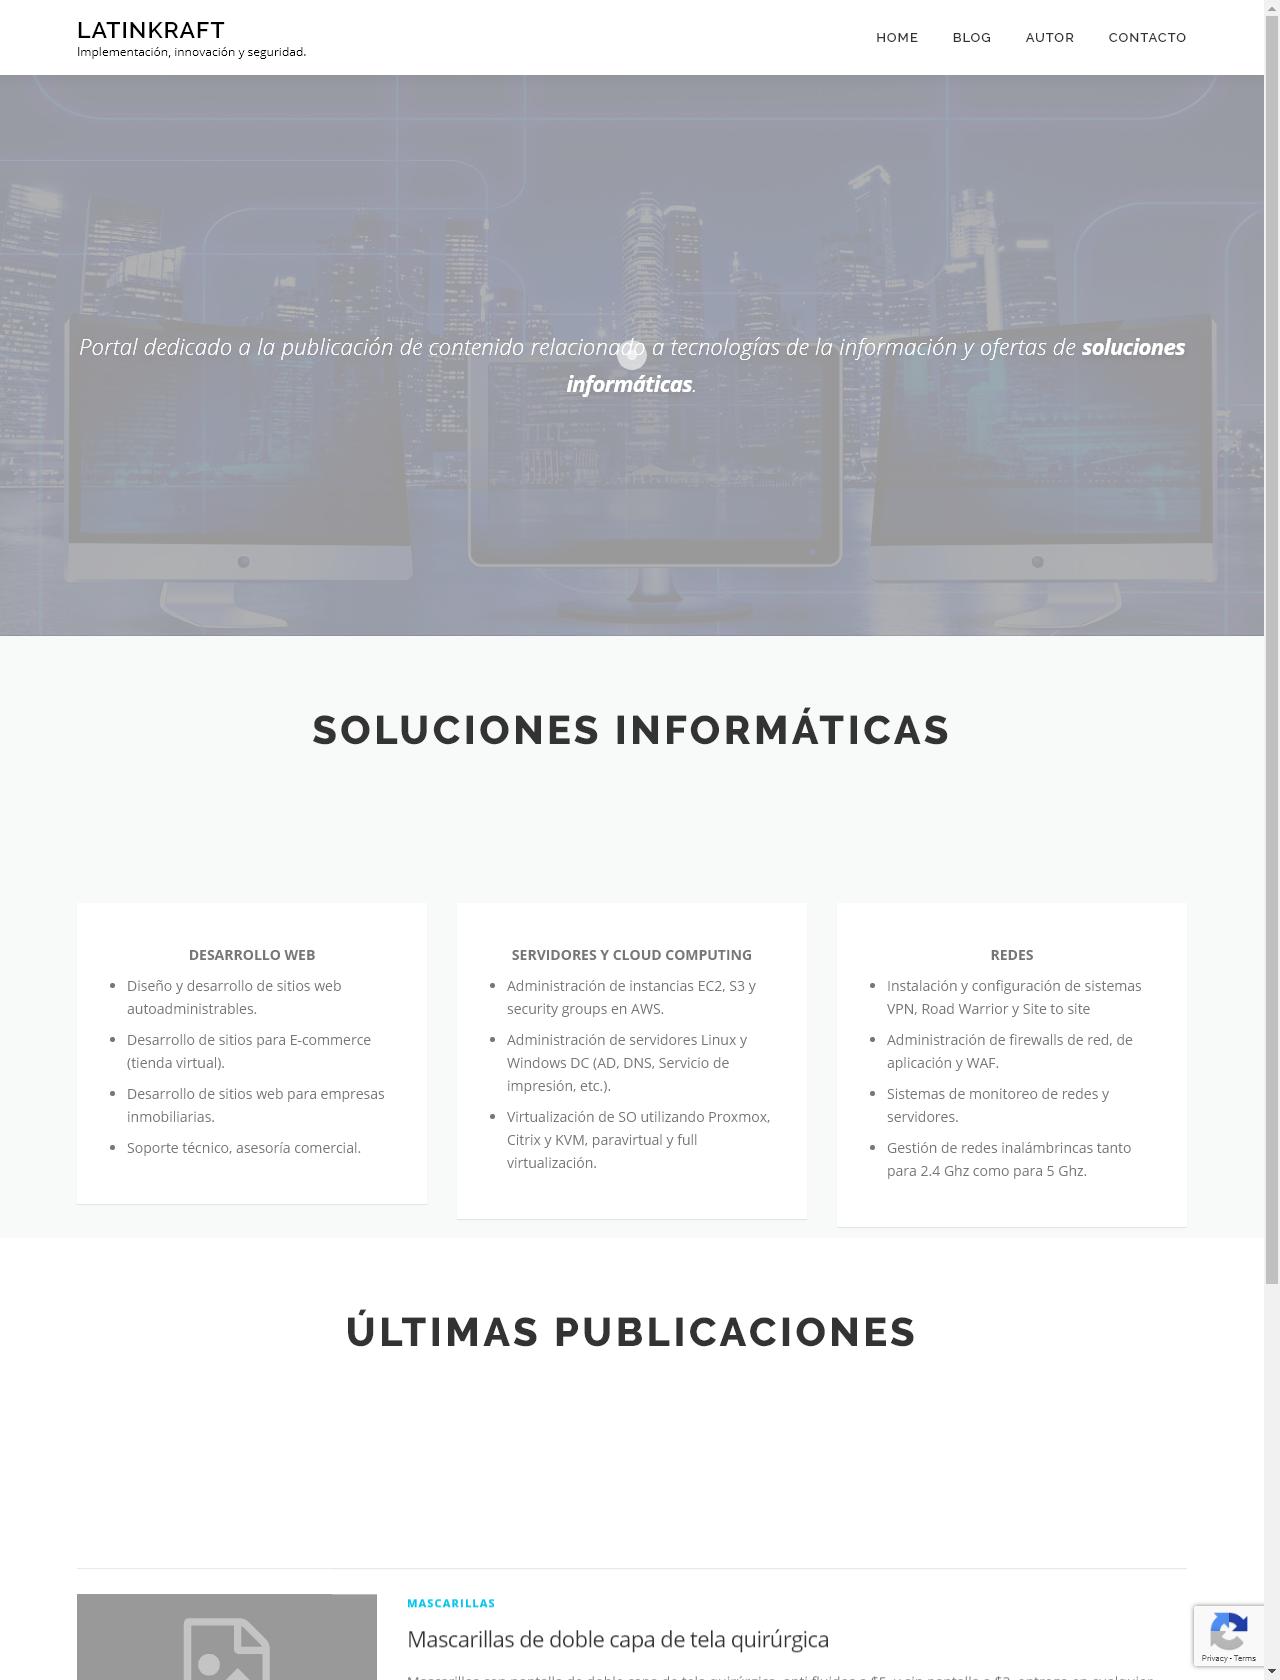 Screenshot Desktop - https://www.latinkraft.com/